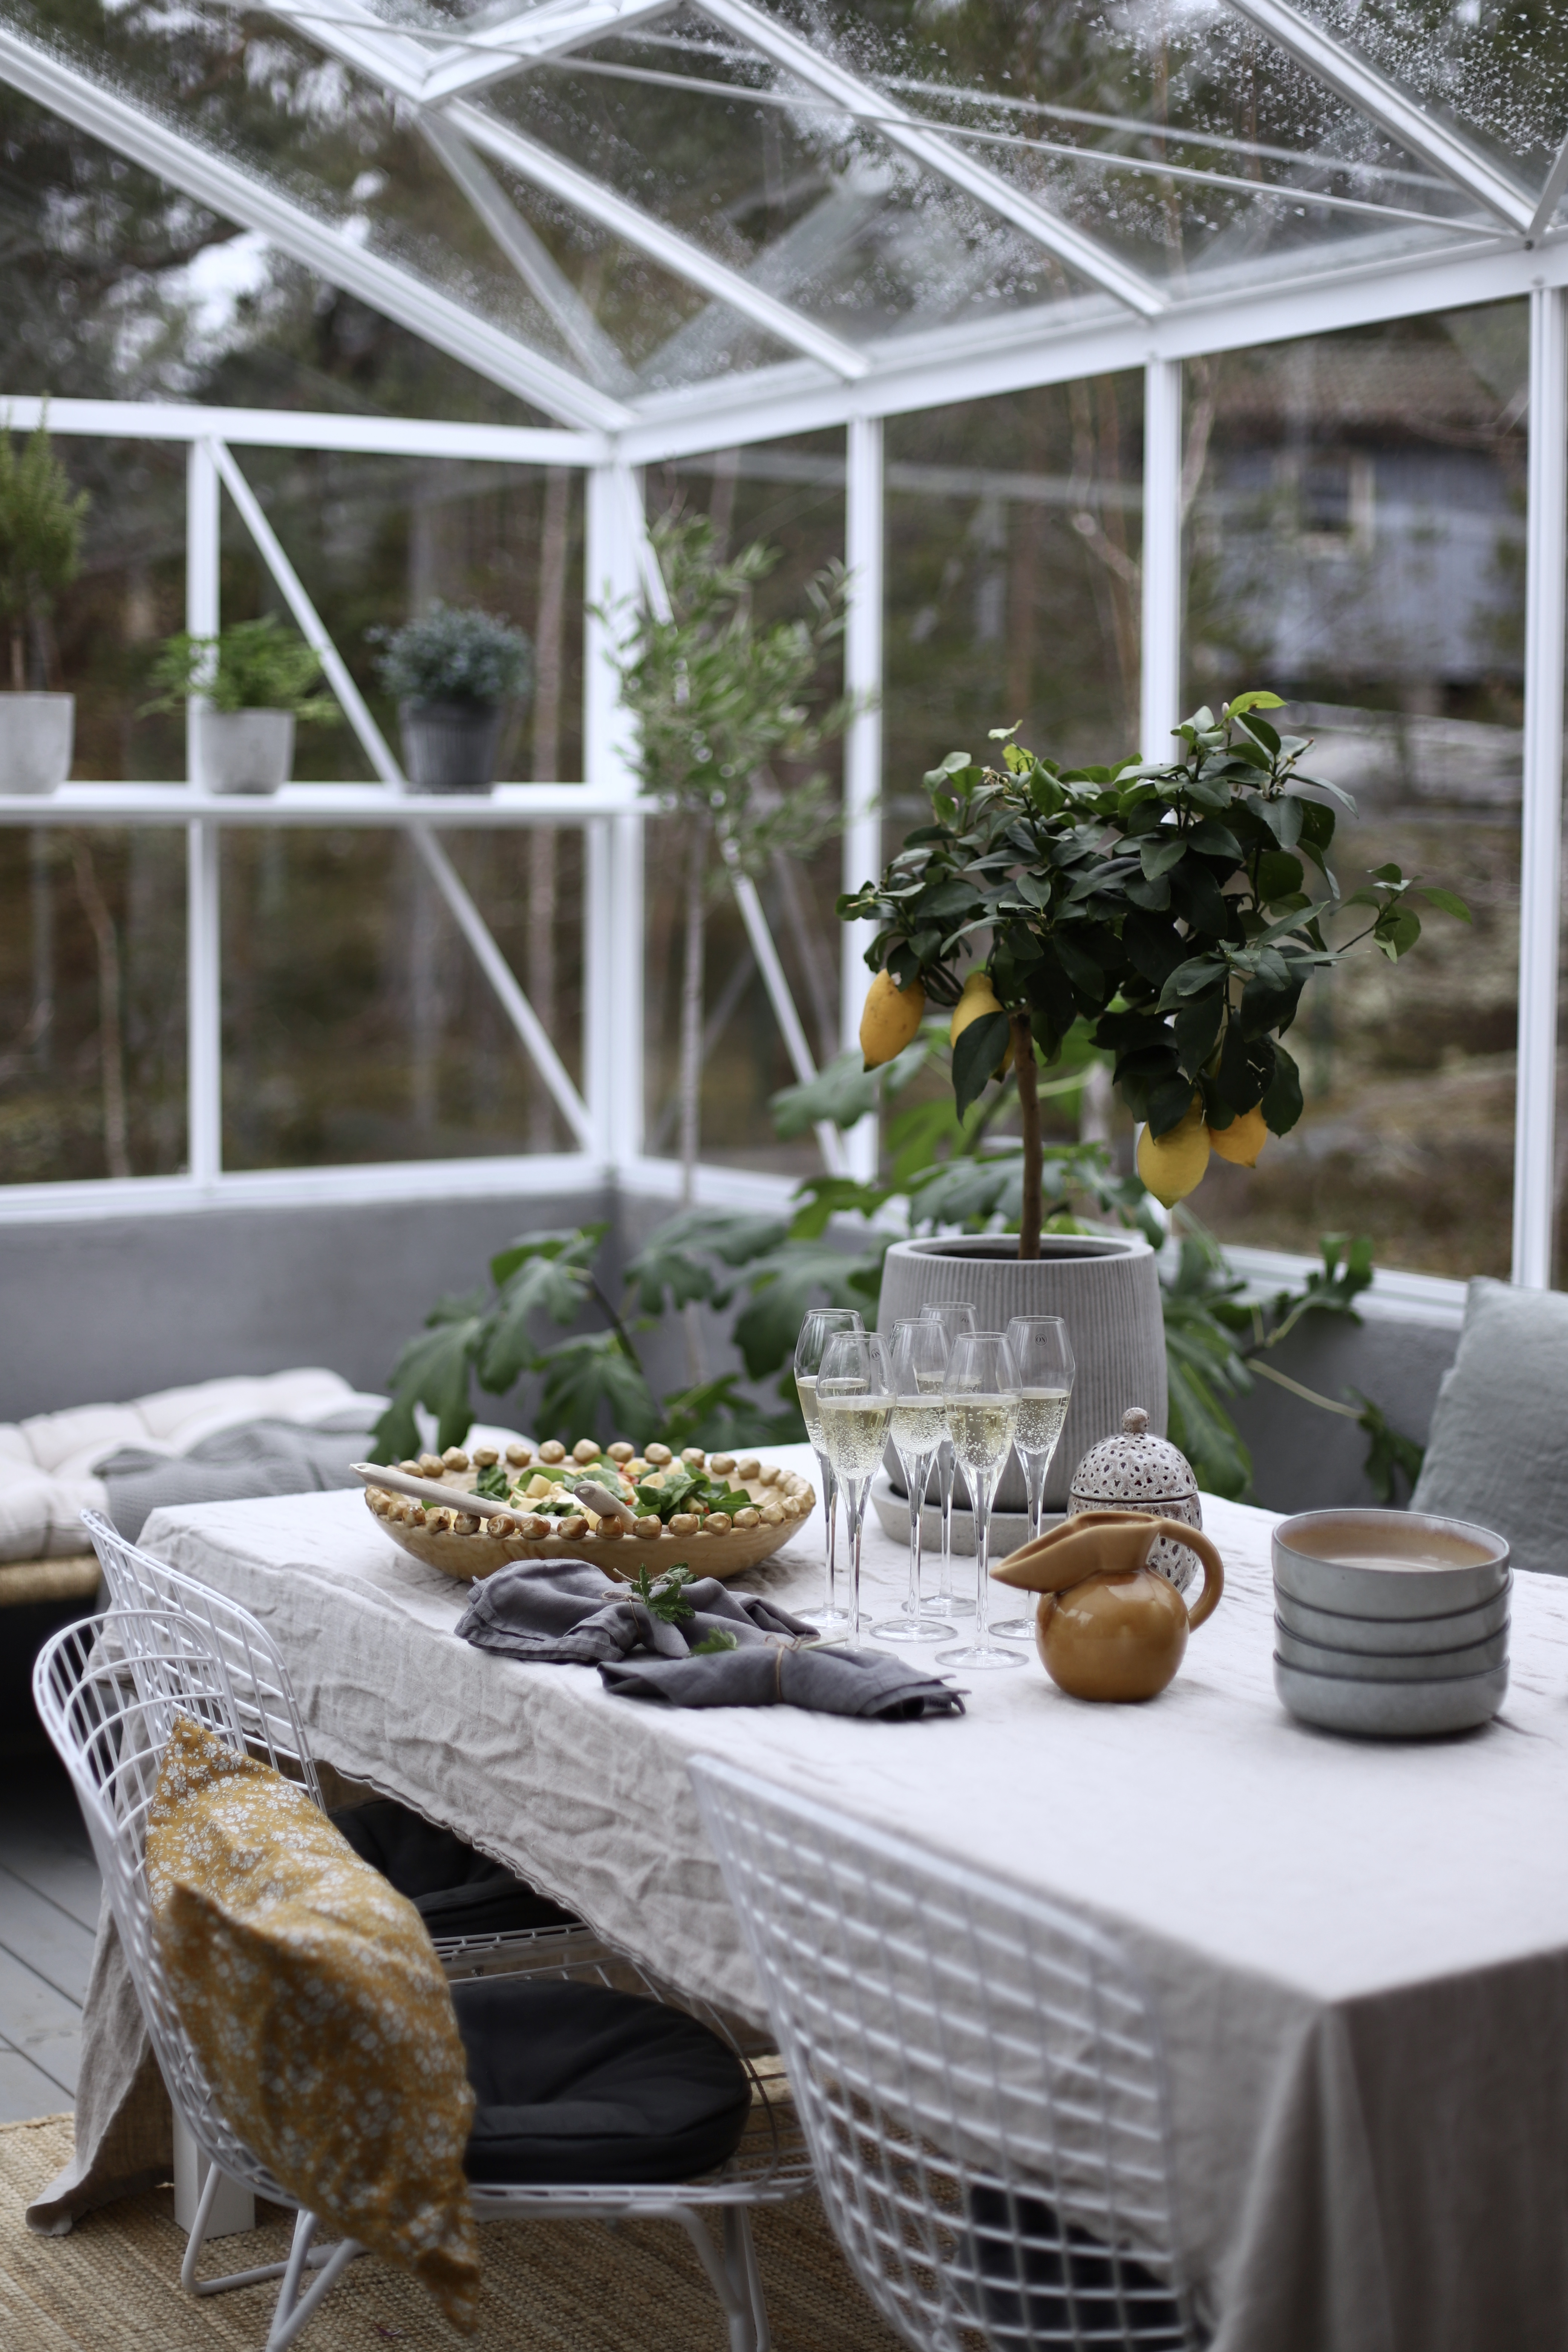 Sommar i växthuset